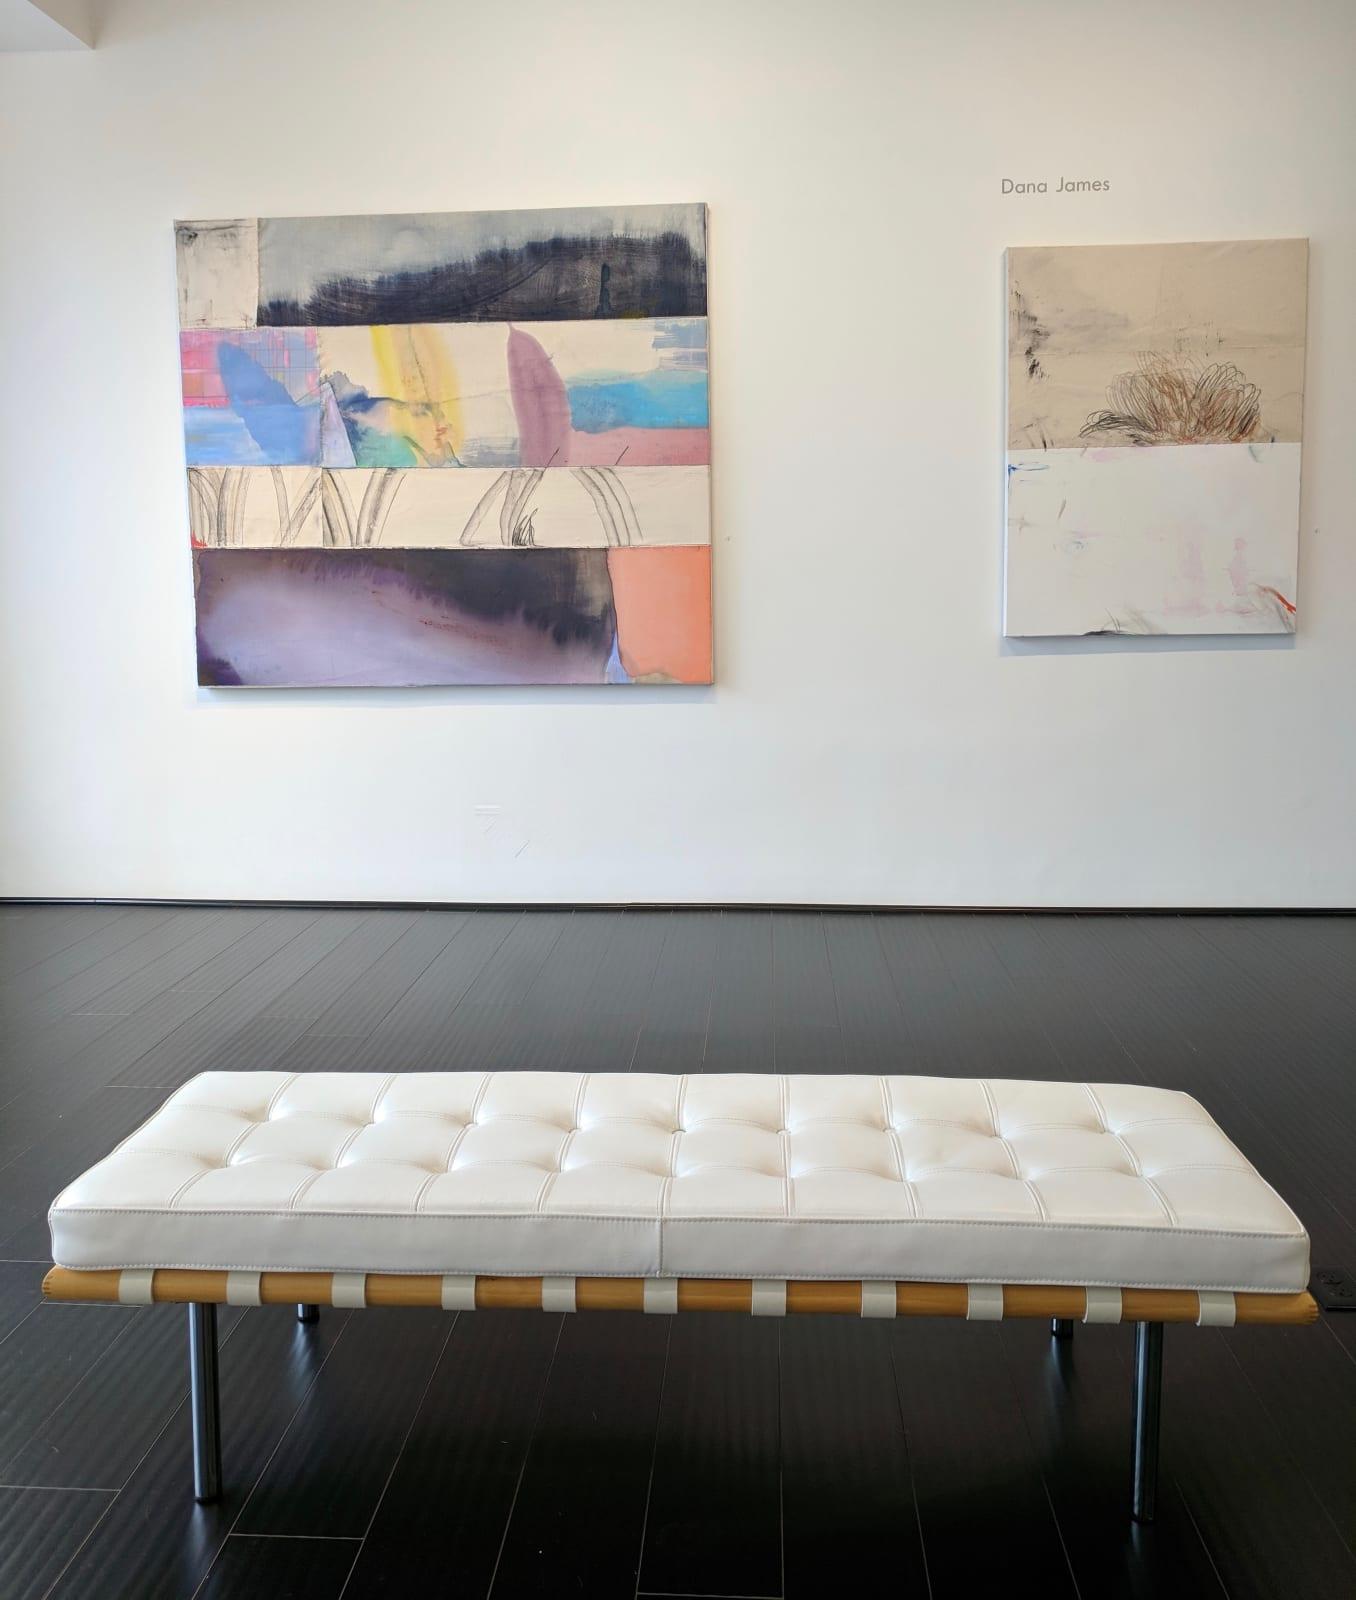 Bring Your Own Sunshine: Nancy Daubenspeck, Dana James and David Konigsberg